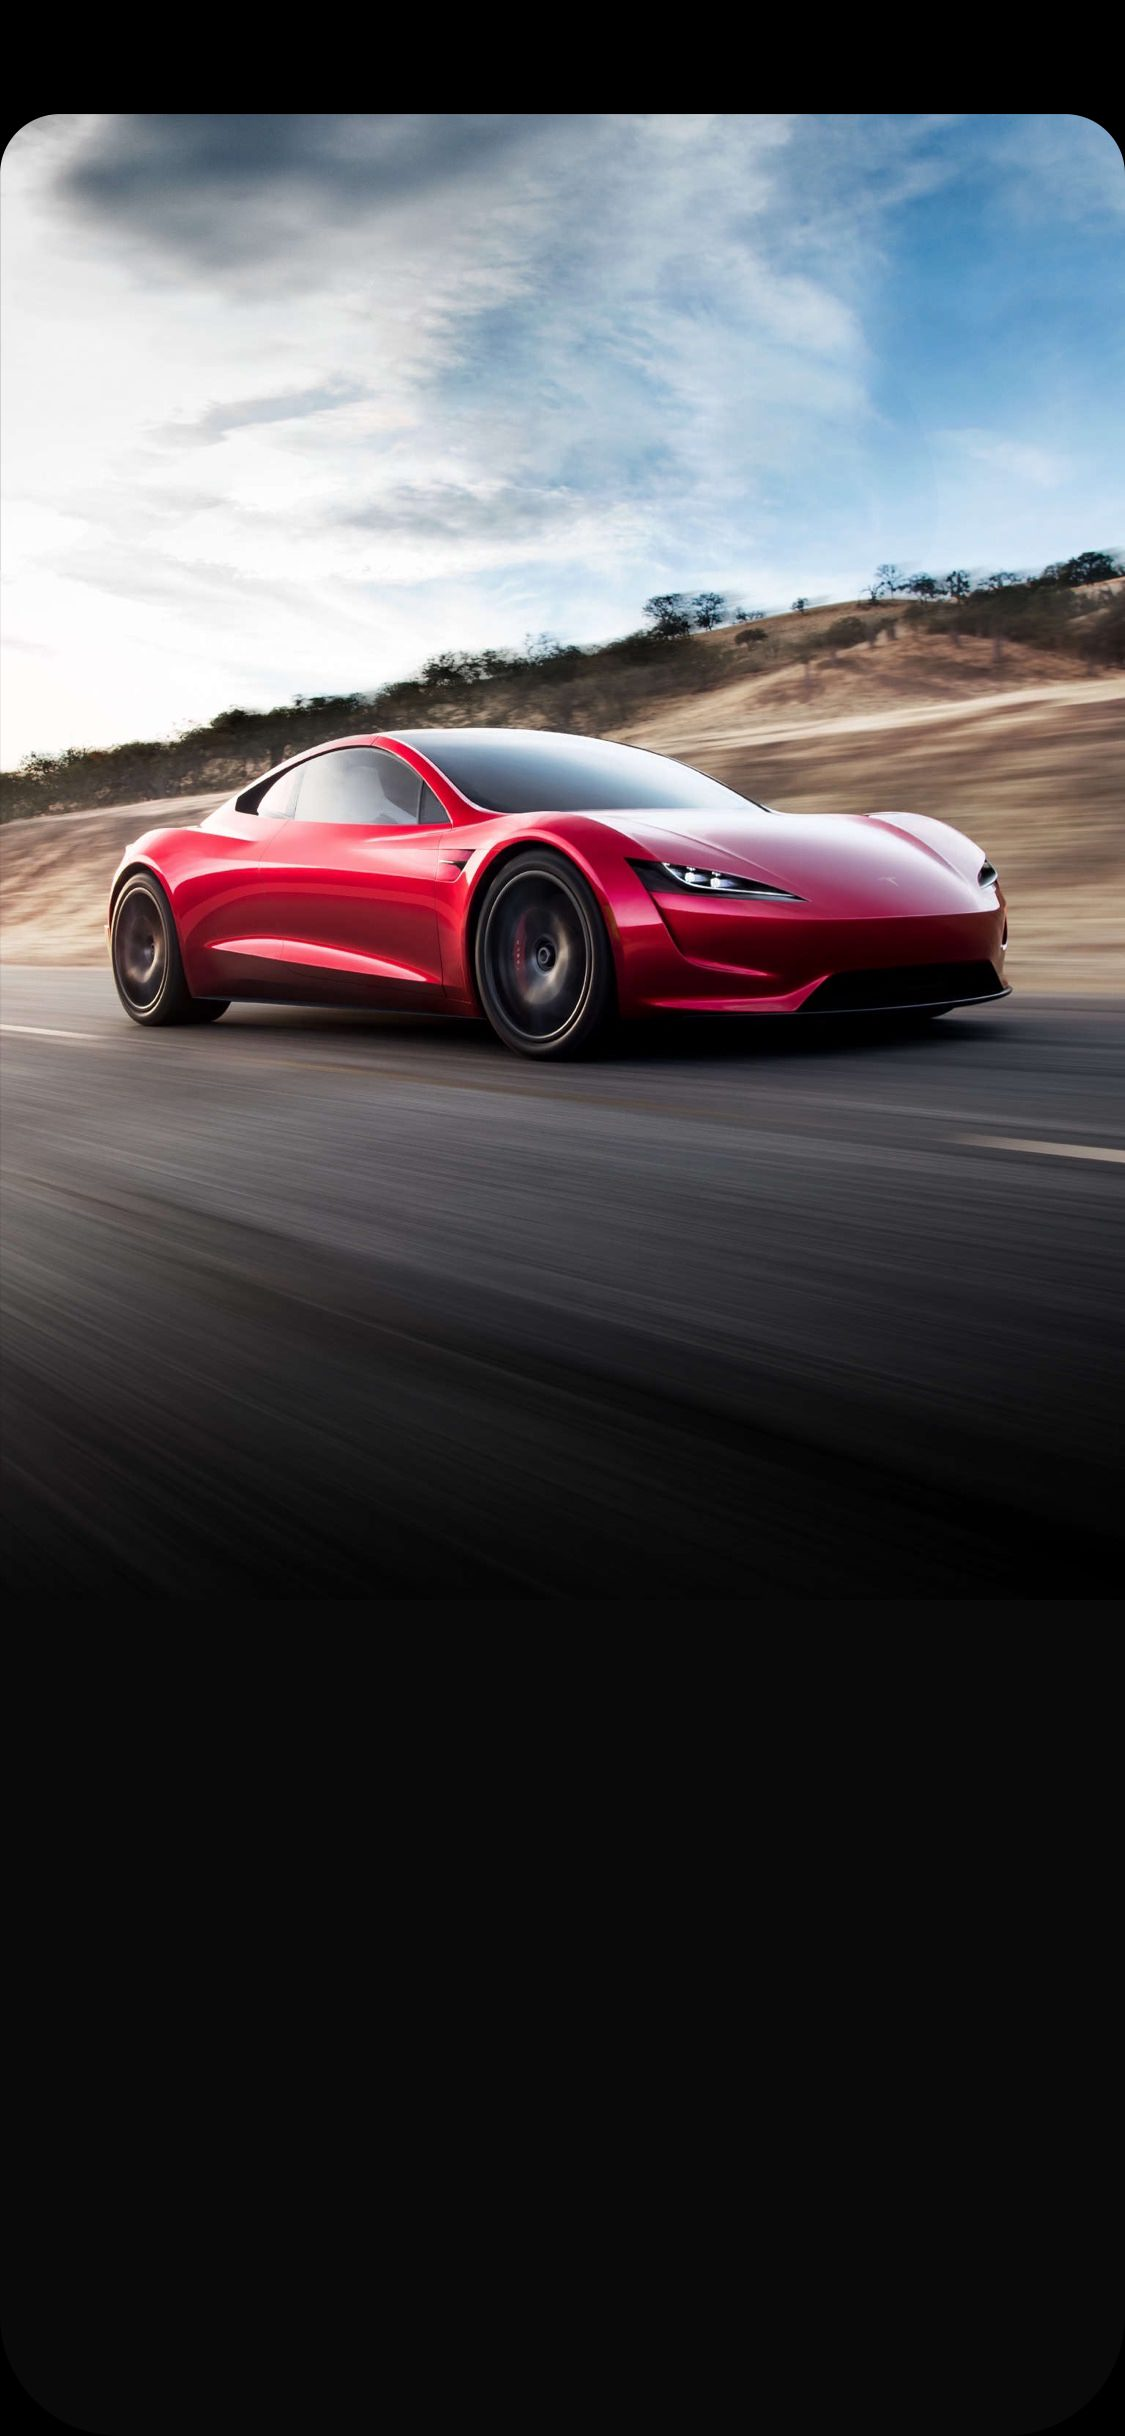 27+ Tesla Roadster Wallpapers on WallpaperSafari